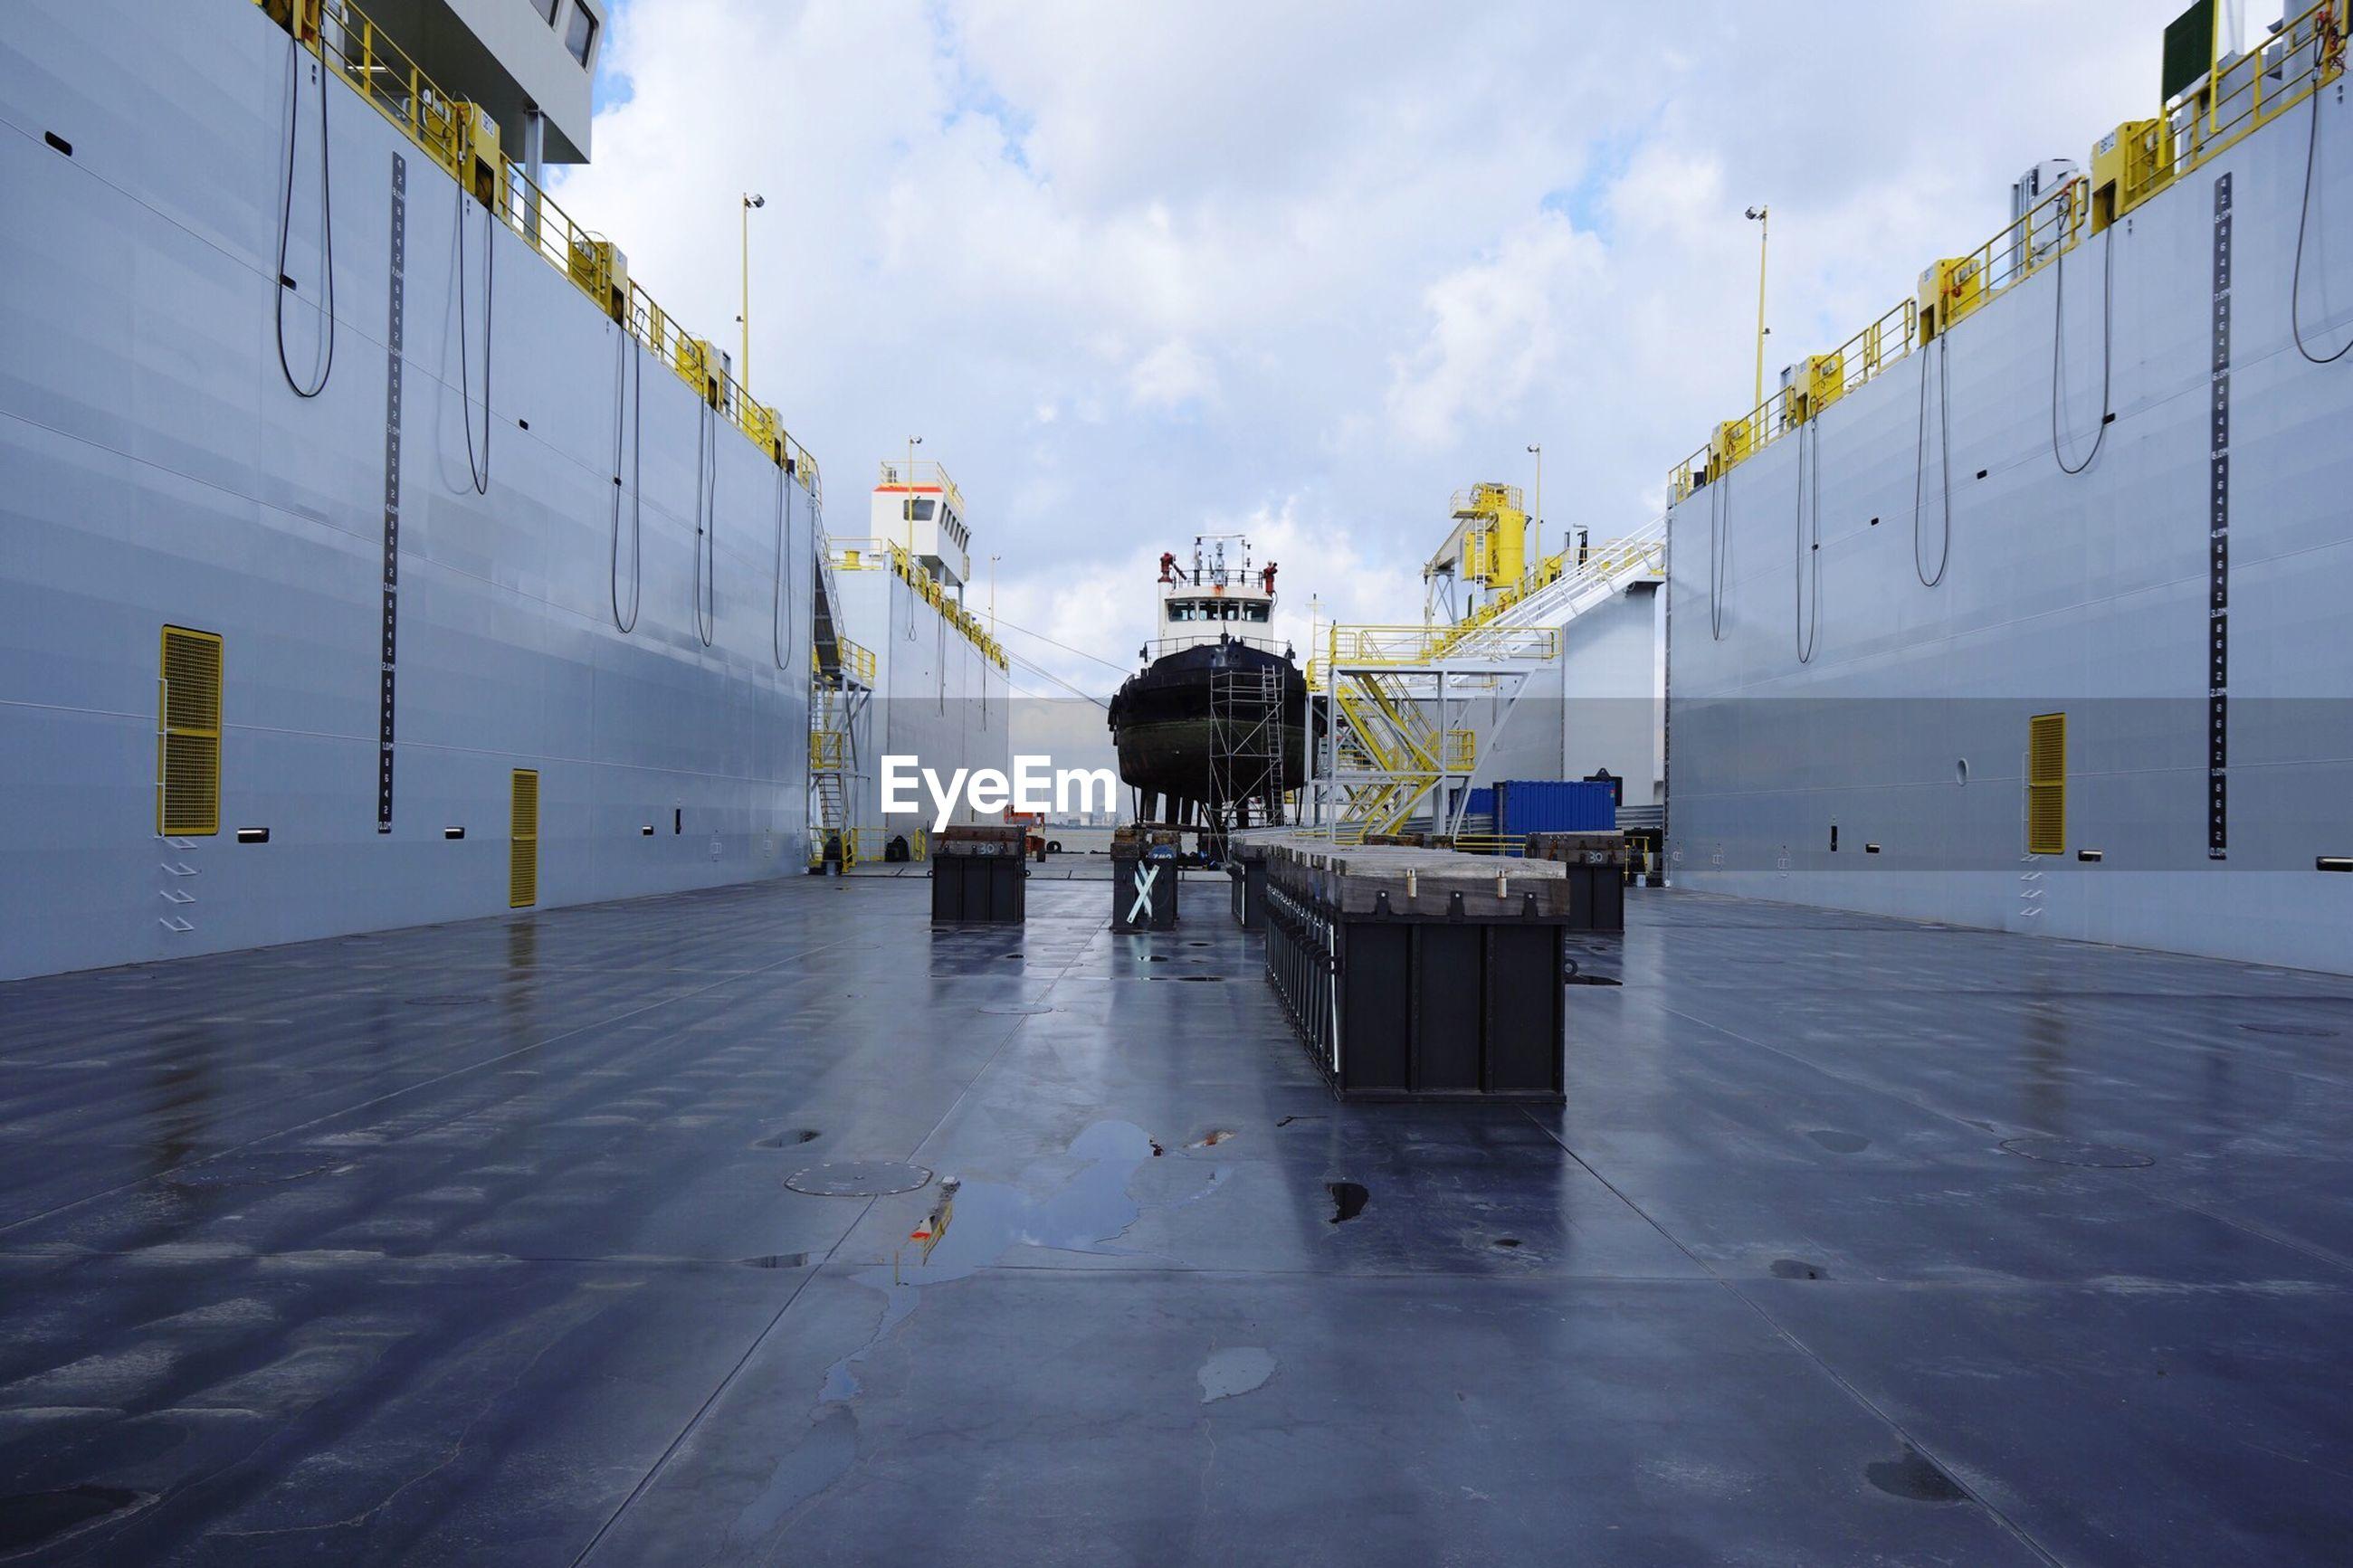 Commercial dock against sky